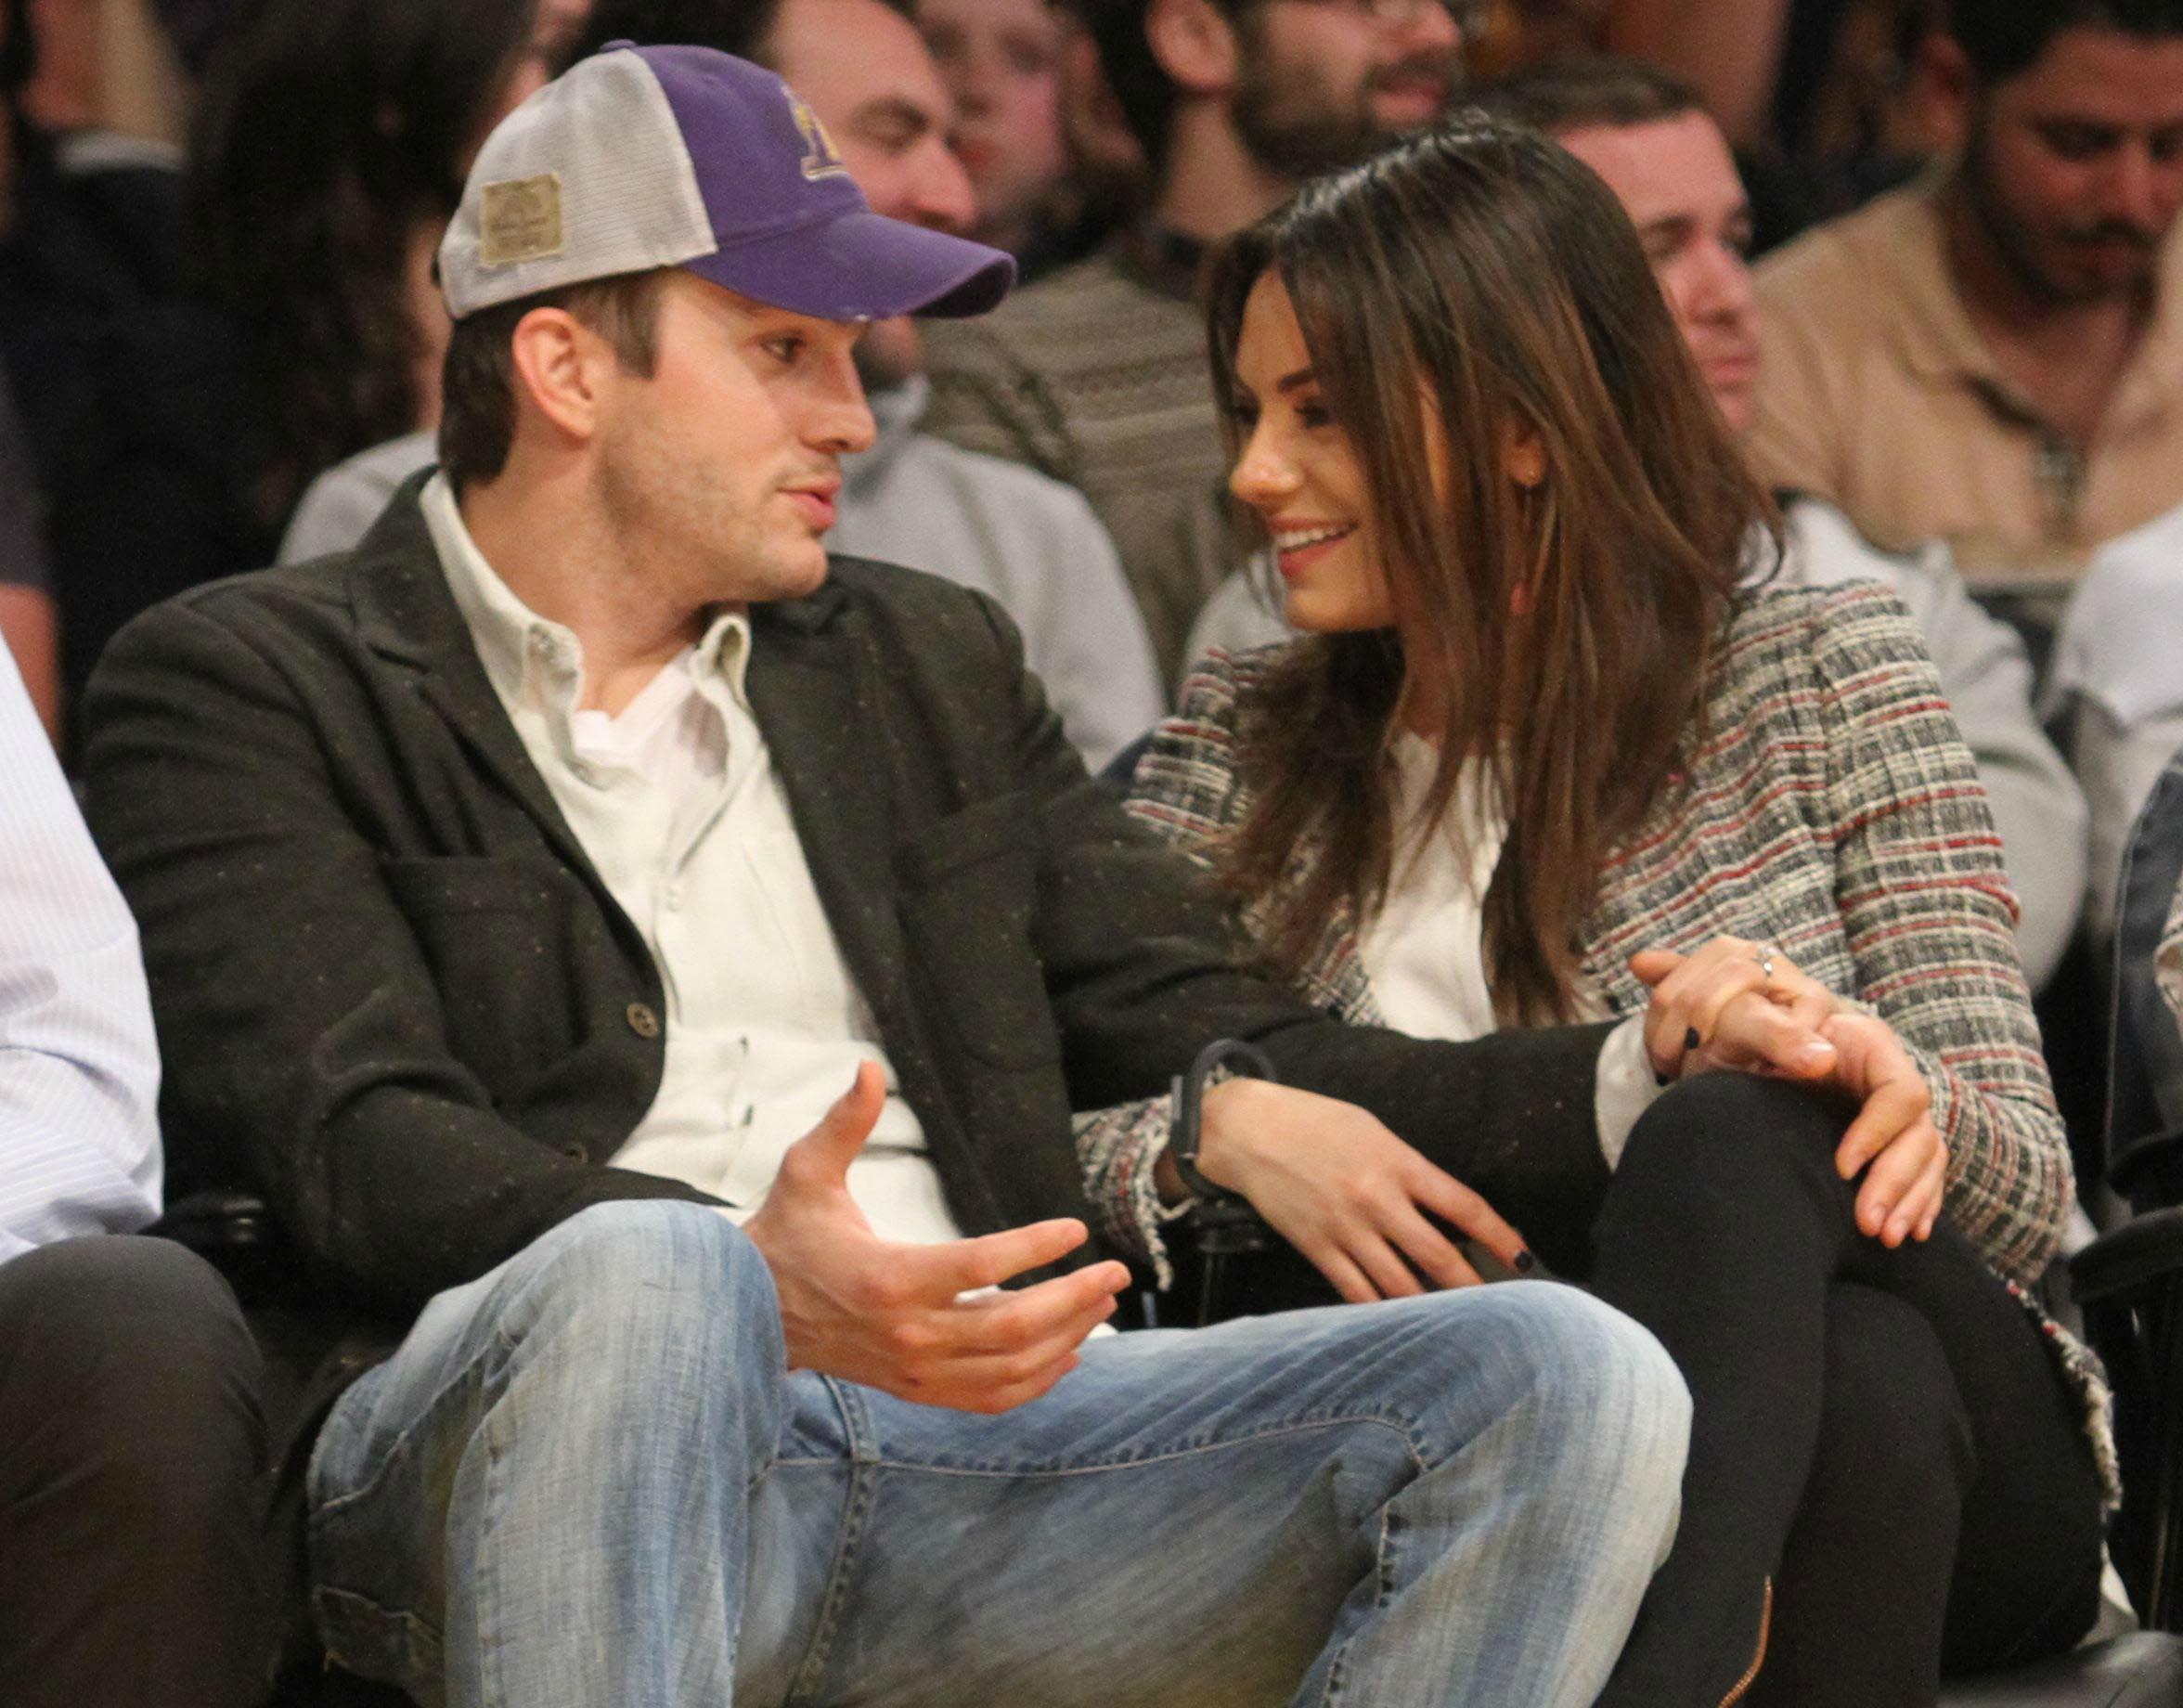 Mila Kunis, Ashton Kutcher are expecting a baby girl